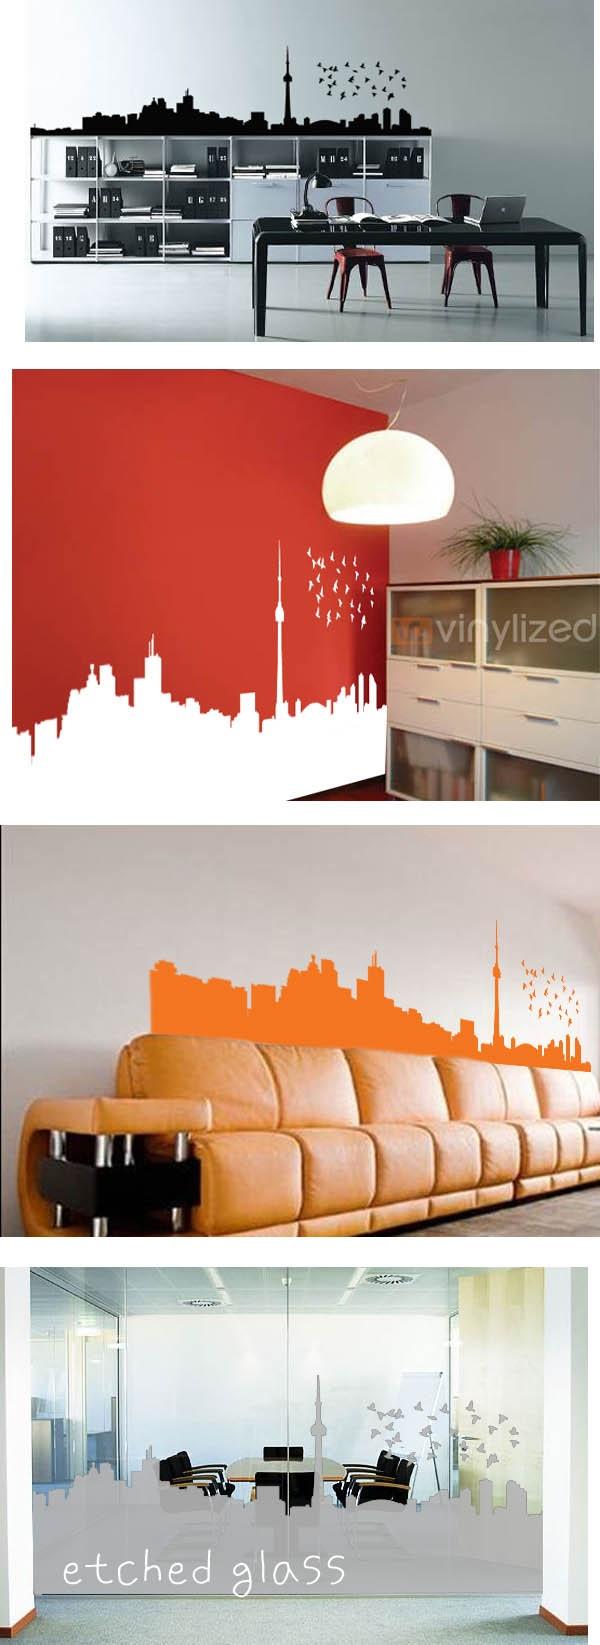 Toronto skyline vinyl options city ccondo designwall decal